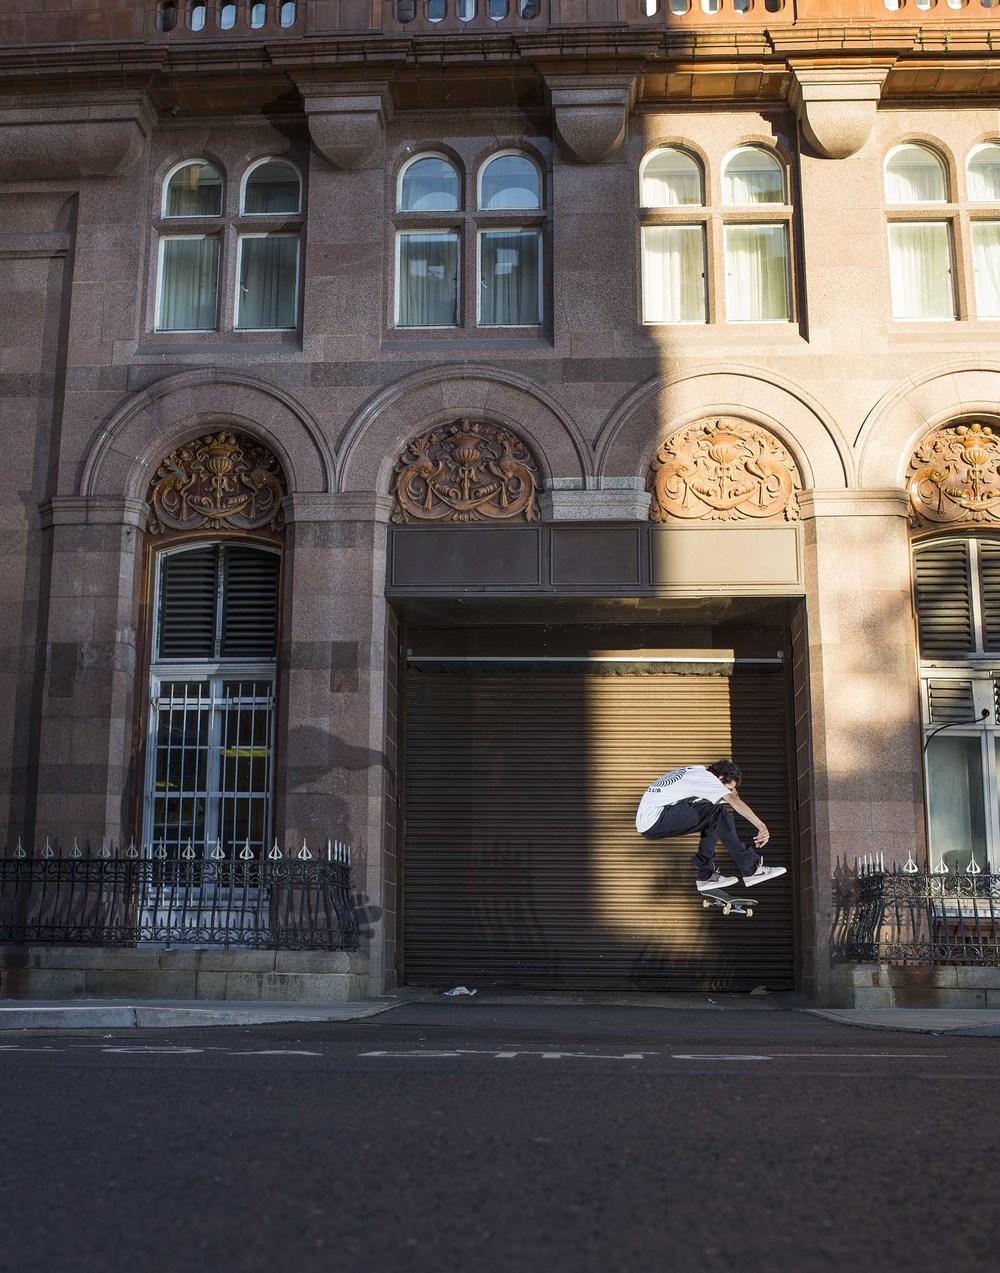 Tyrone O' Hanrahan - frontside flip